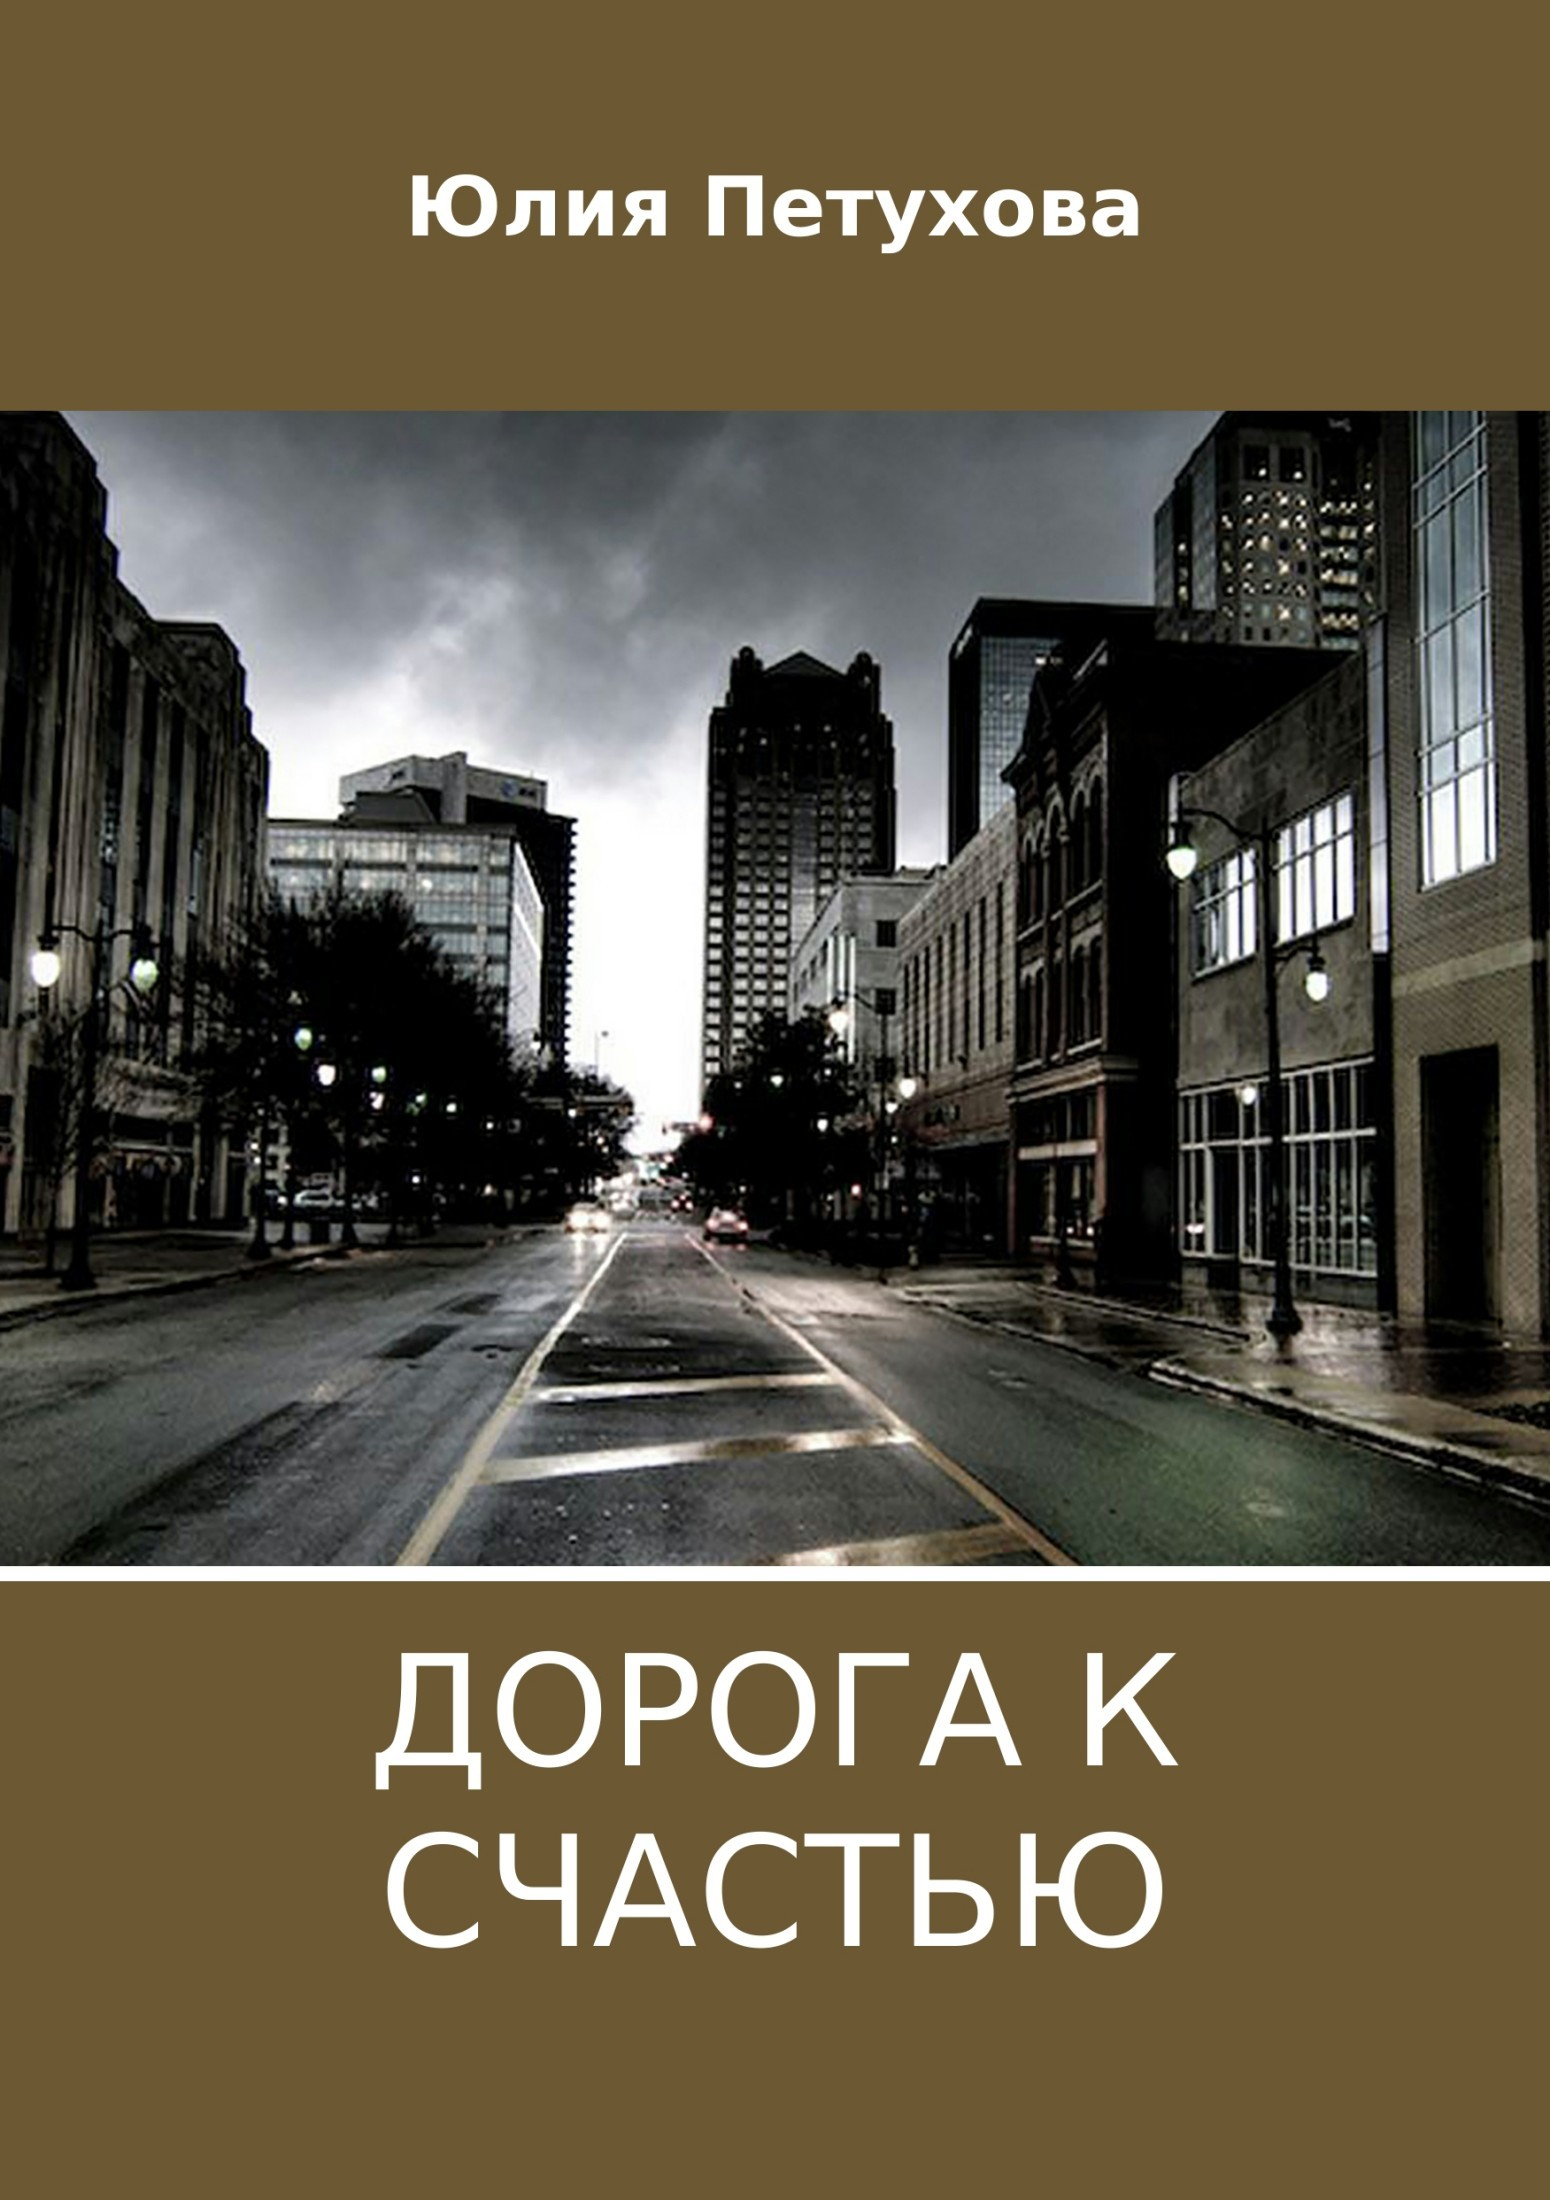 Юлия Петухова Дорога к счастью юлия петухова дорога к счастью